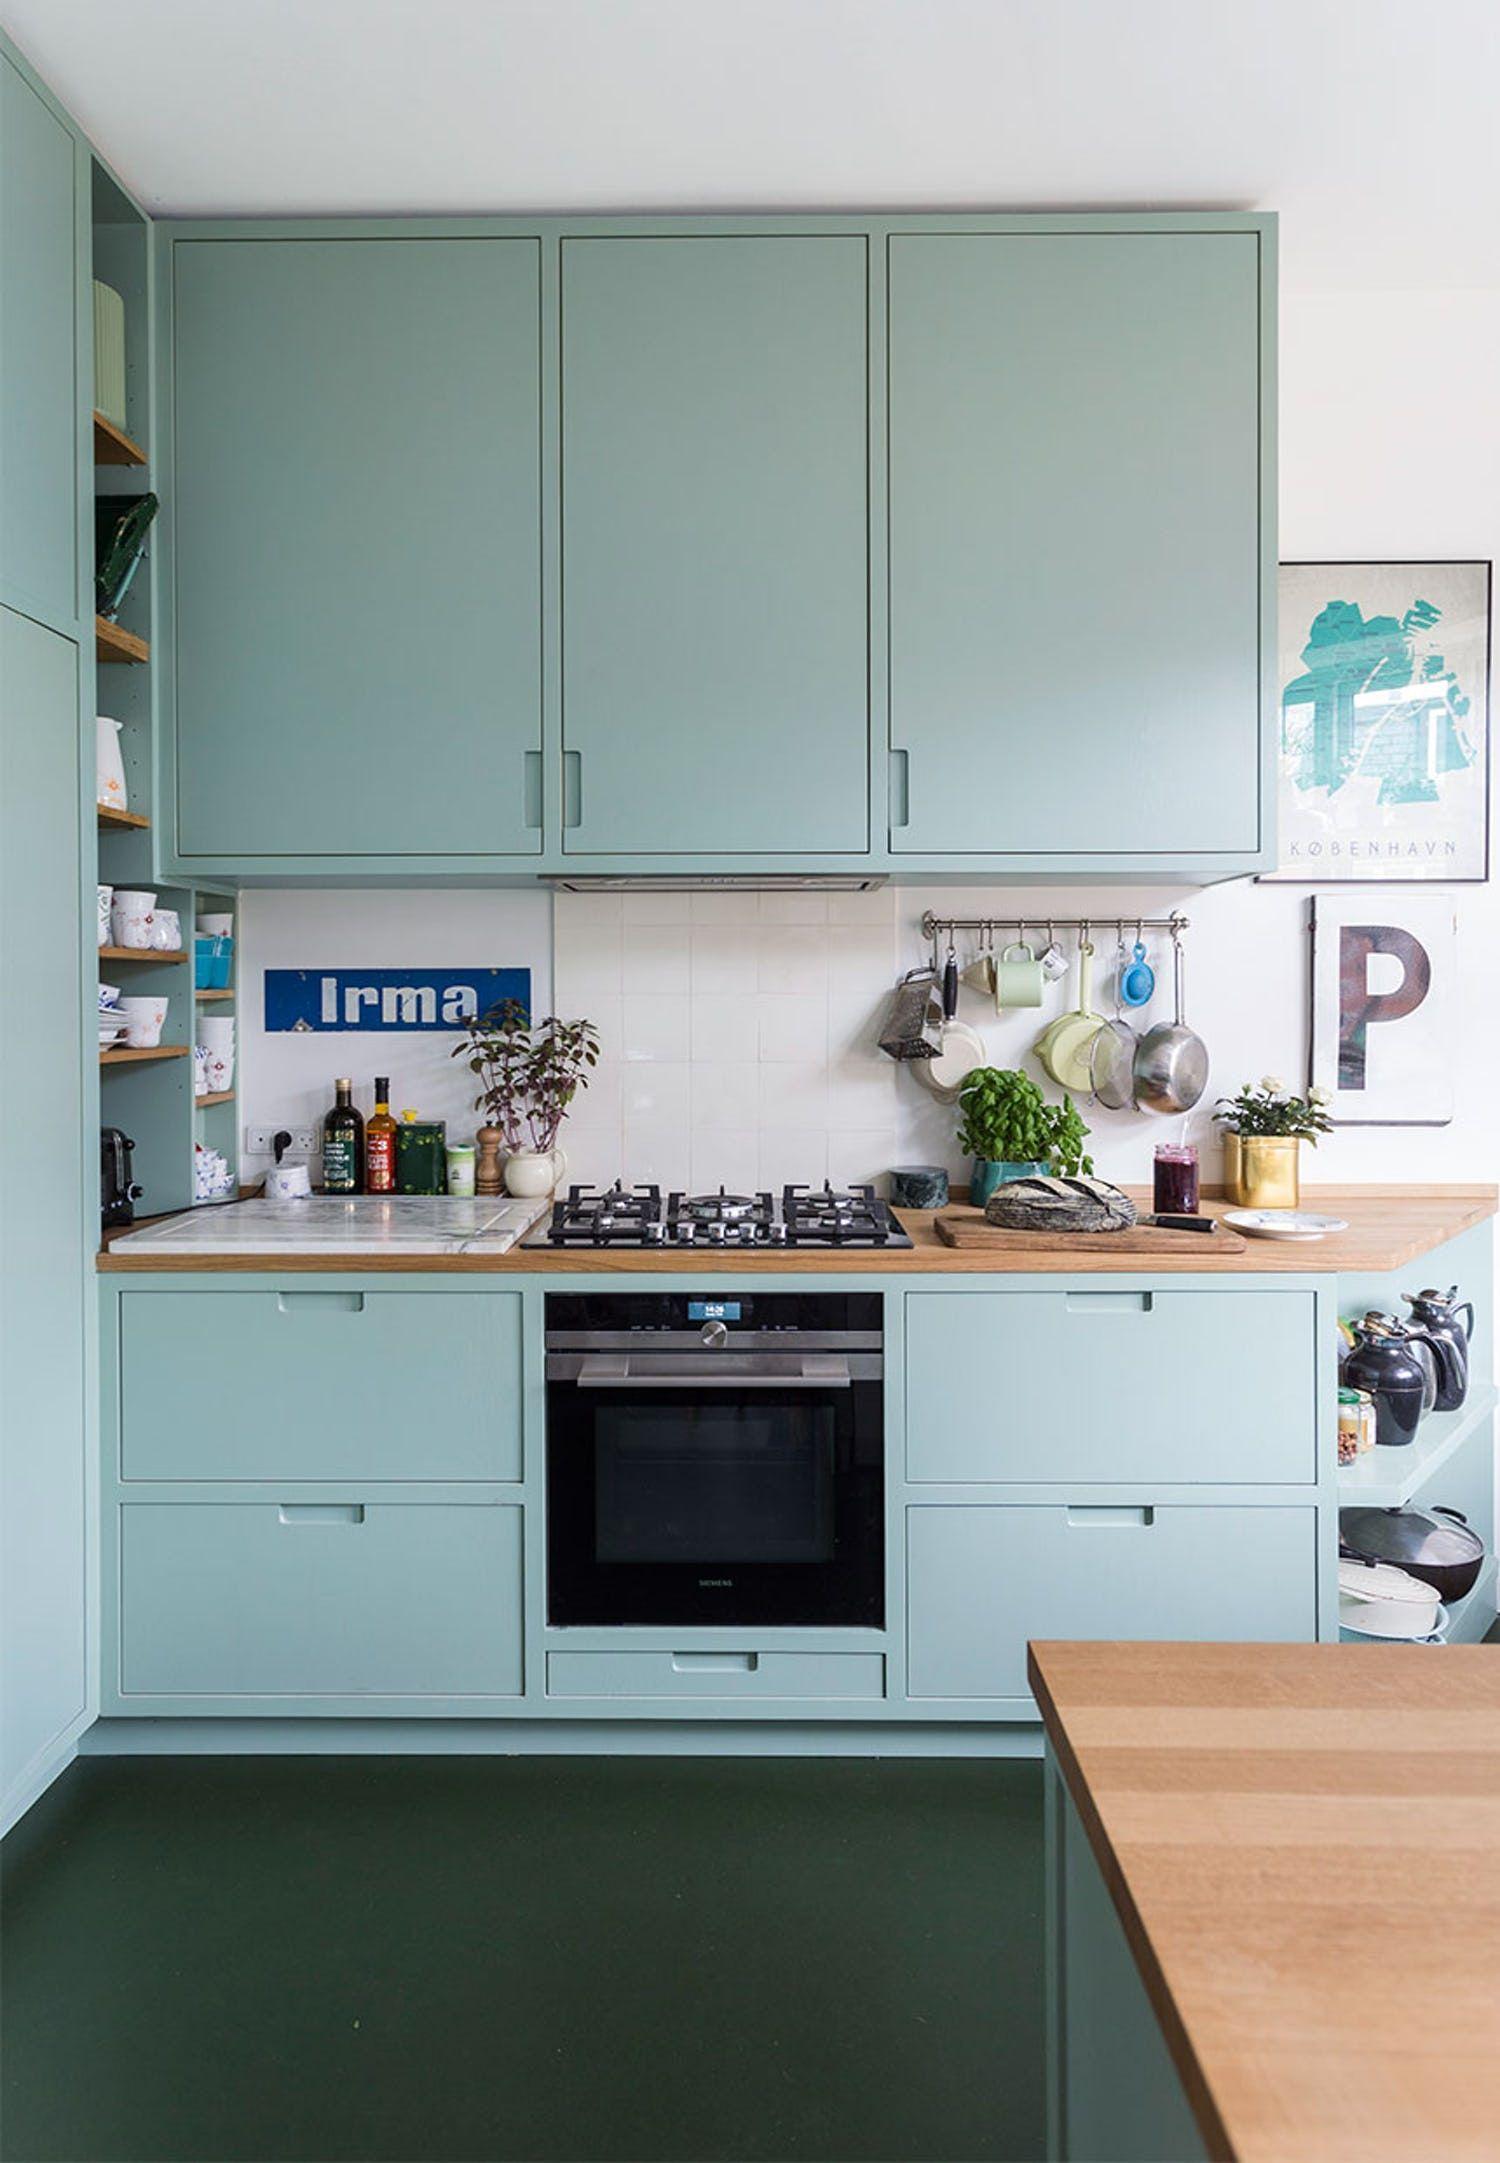 50 Amazing Small Apartment Kitchen Decor Ideas | Kitchens, Small ...